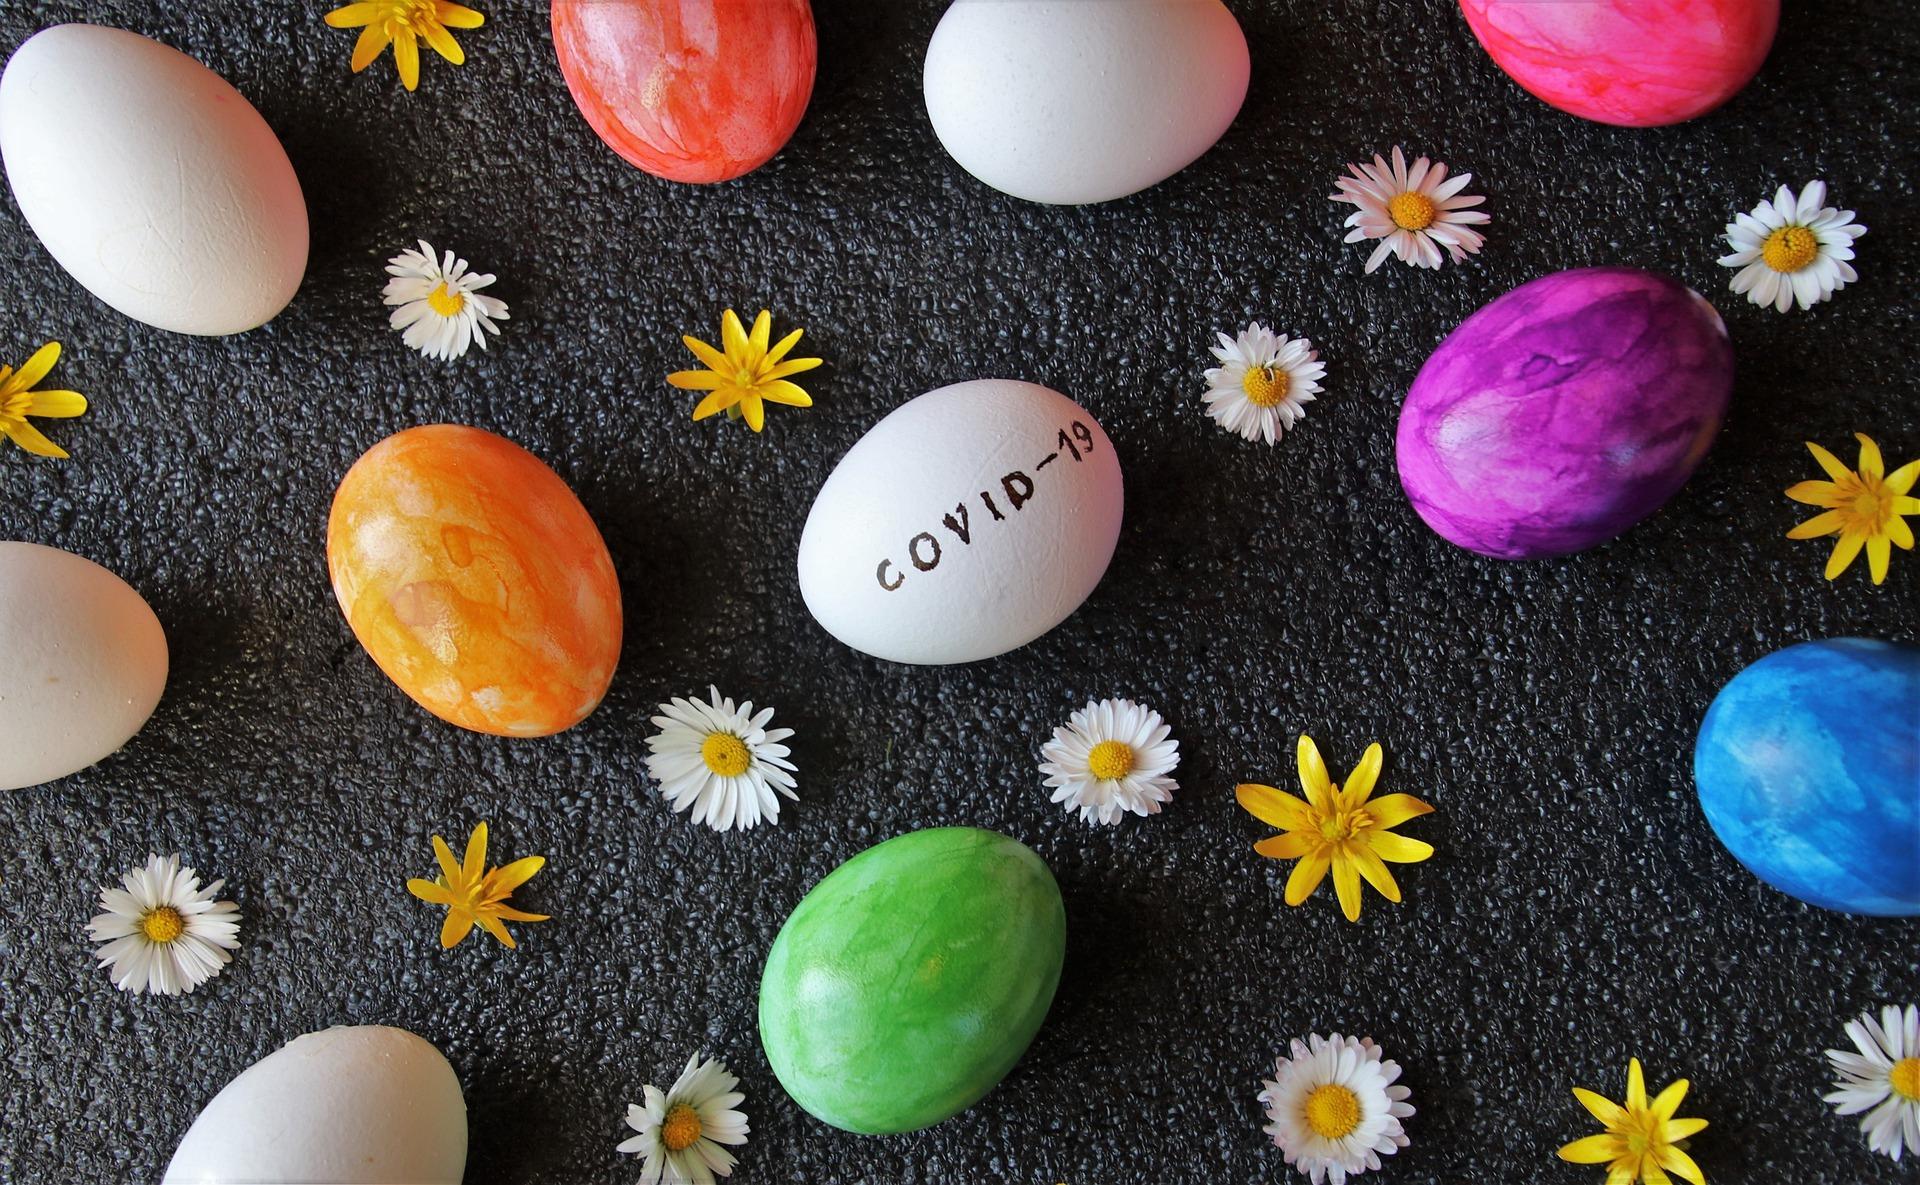 eggs-4991809_1920